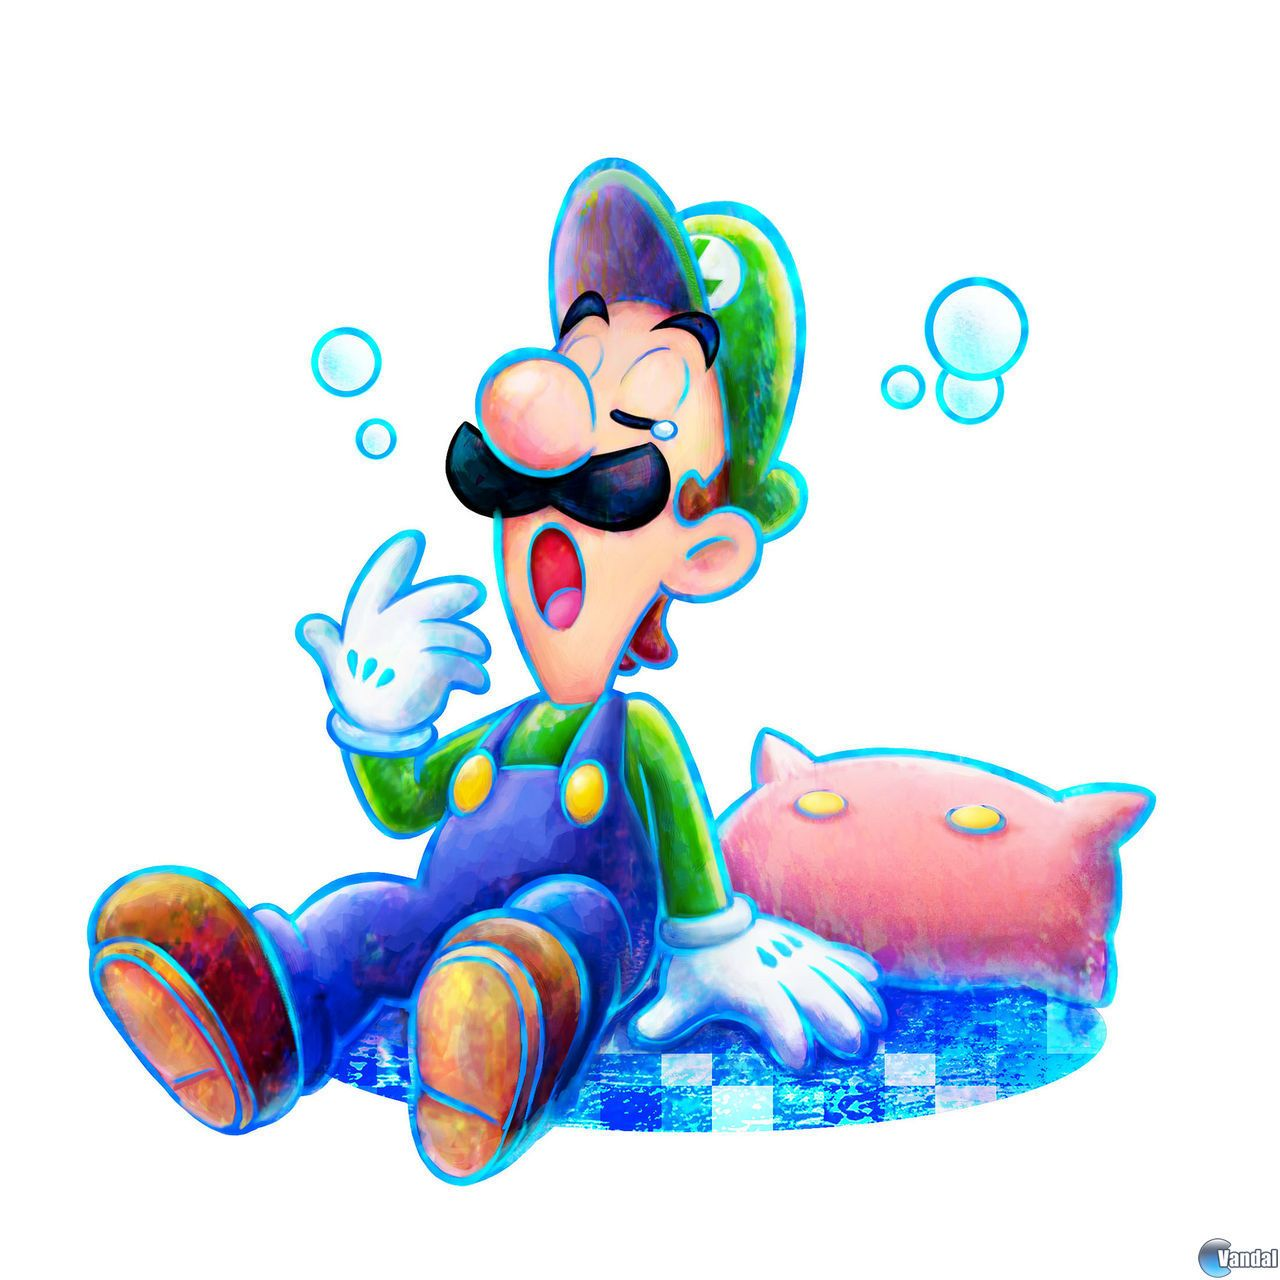 Mario and Luigi Dream Team by wizardofflames on deviantART